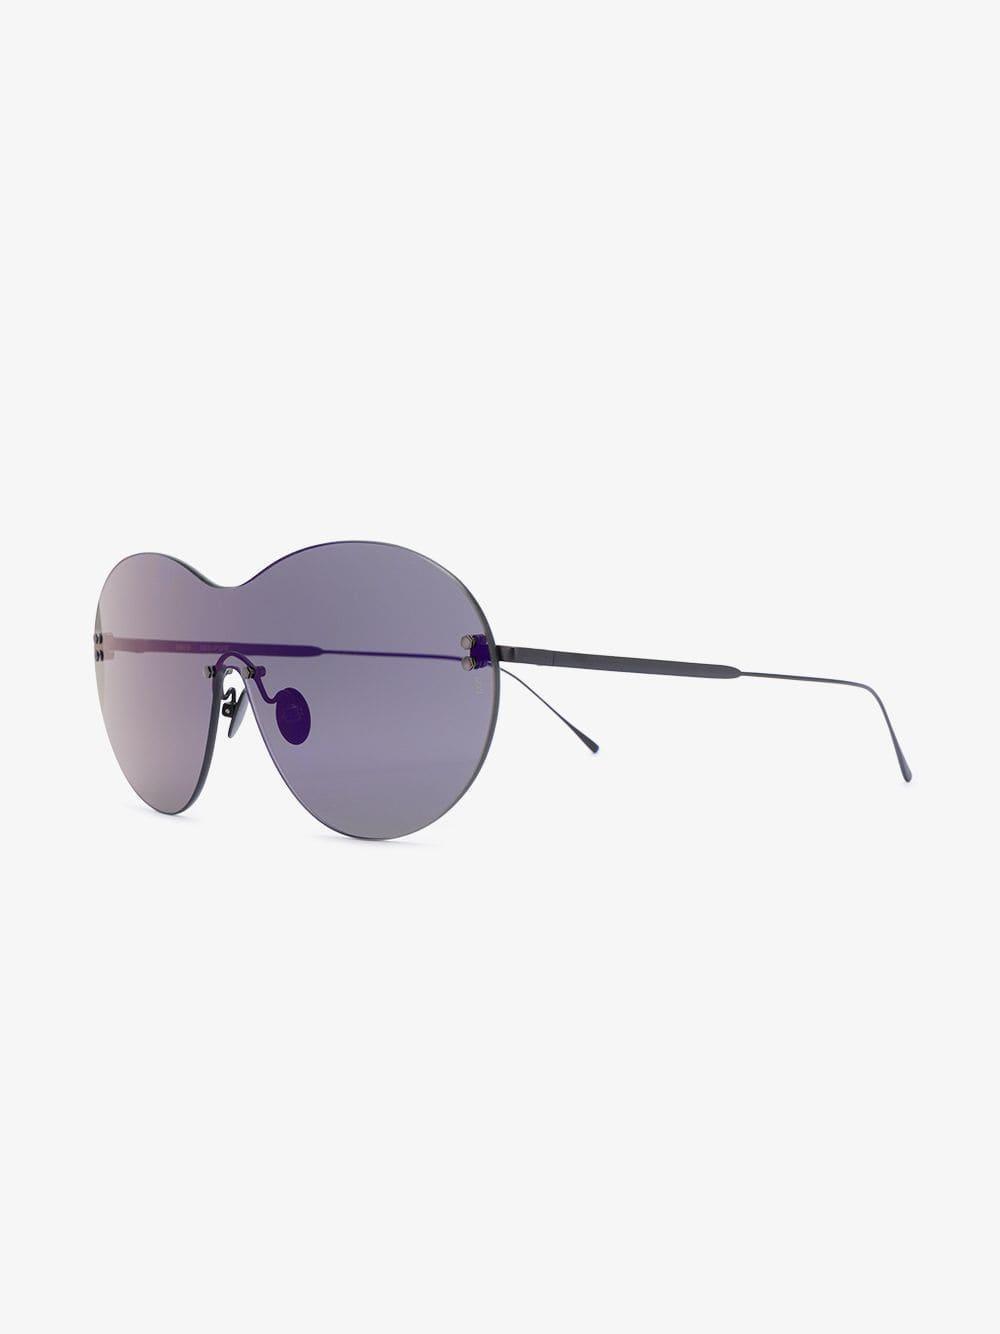 96a2aa76045e4 Sunday Somewhere Ladies Black Purple Iris Shield Sunglasses